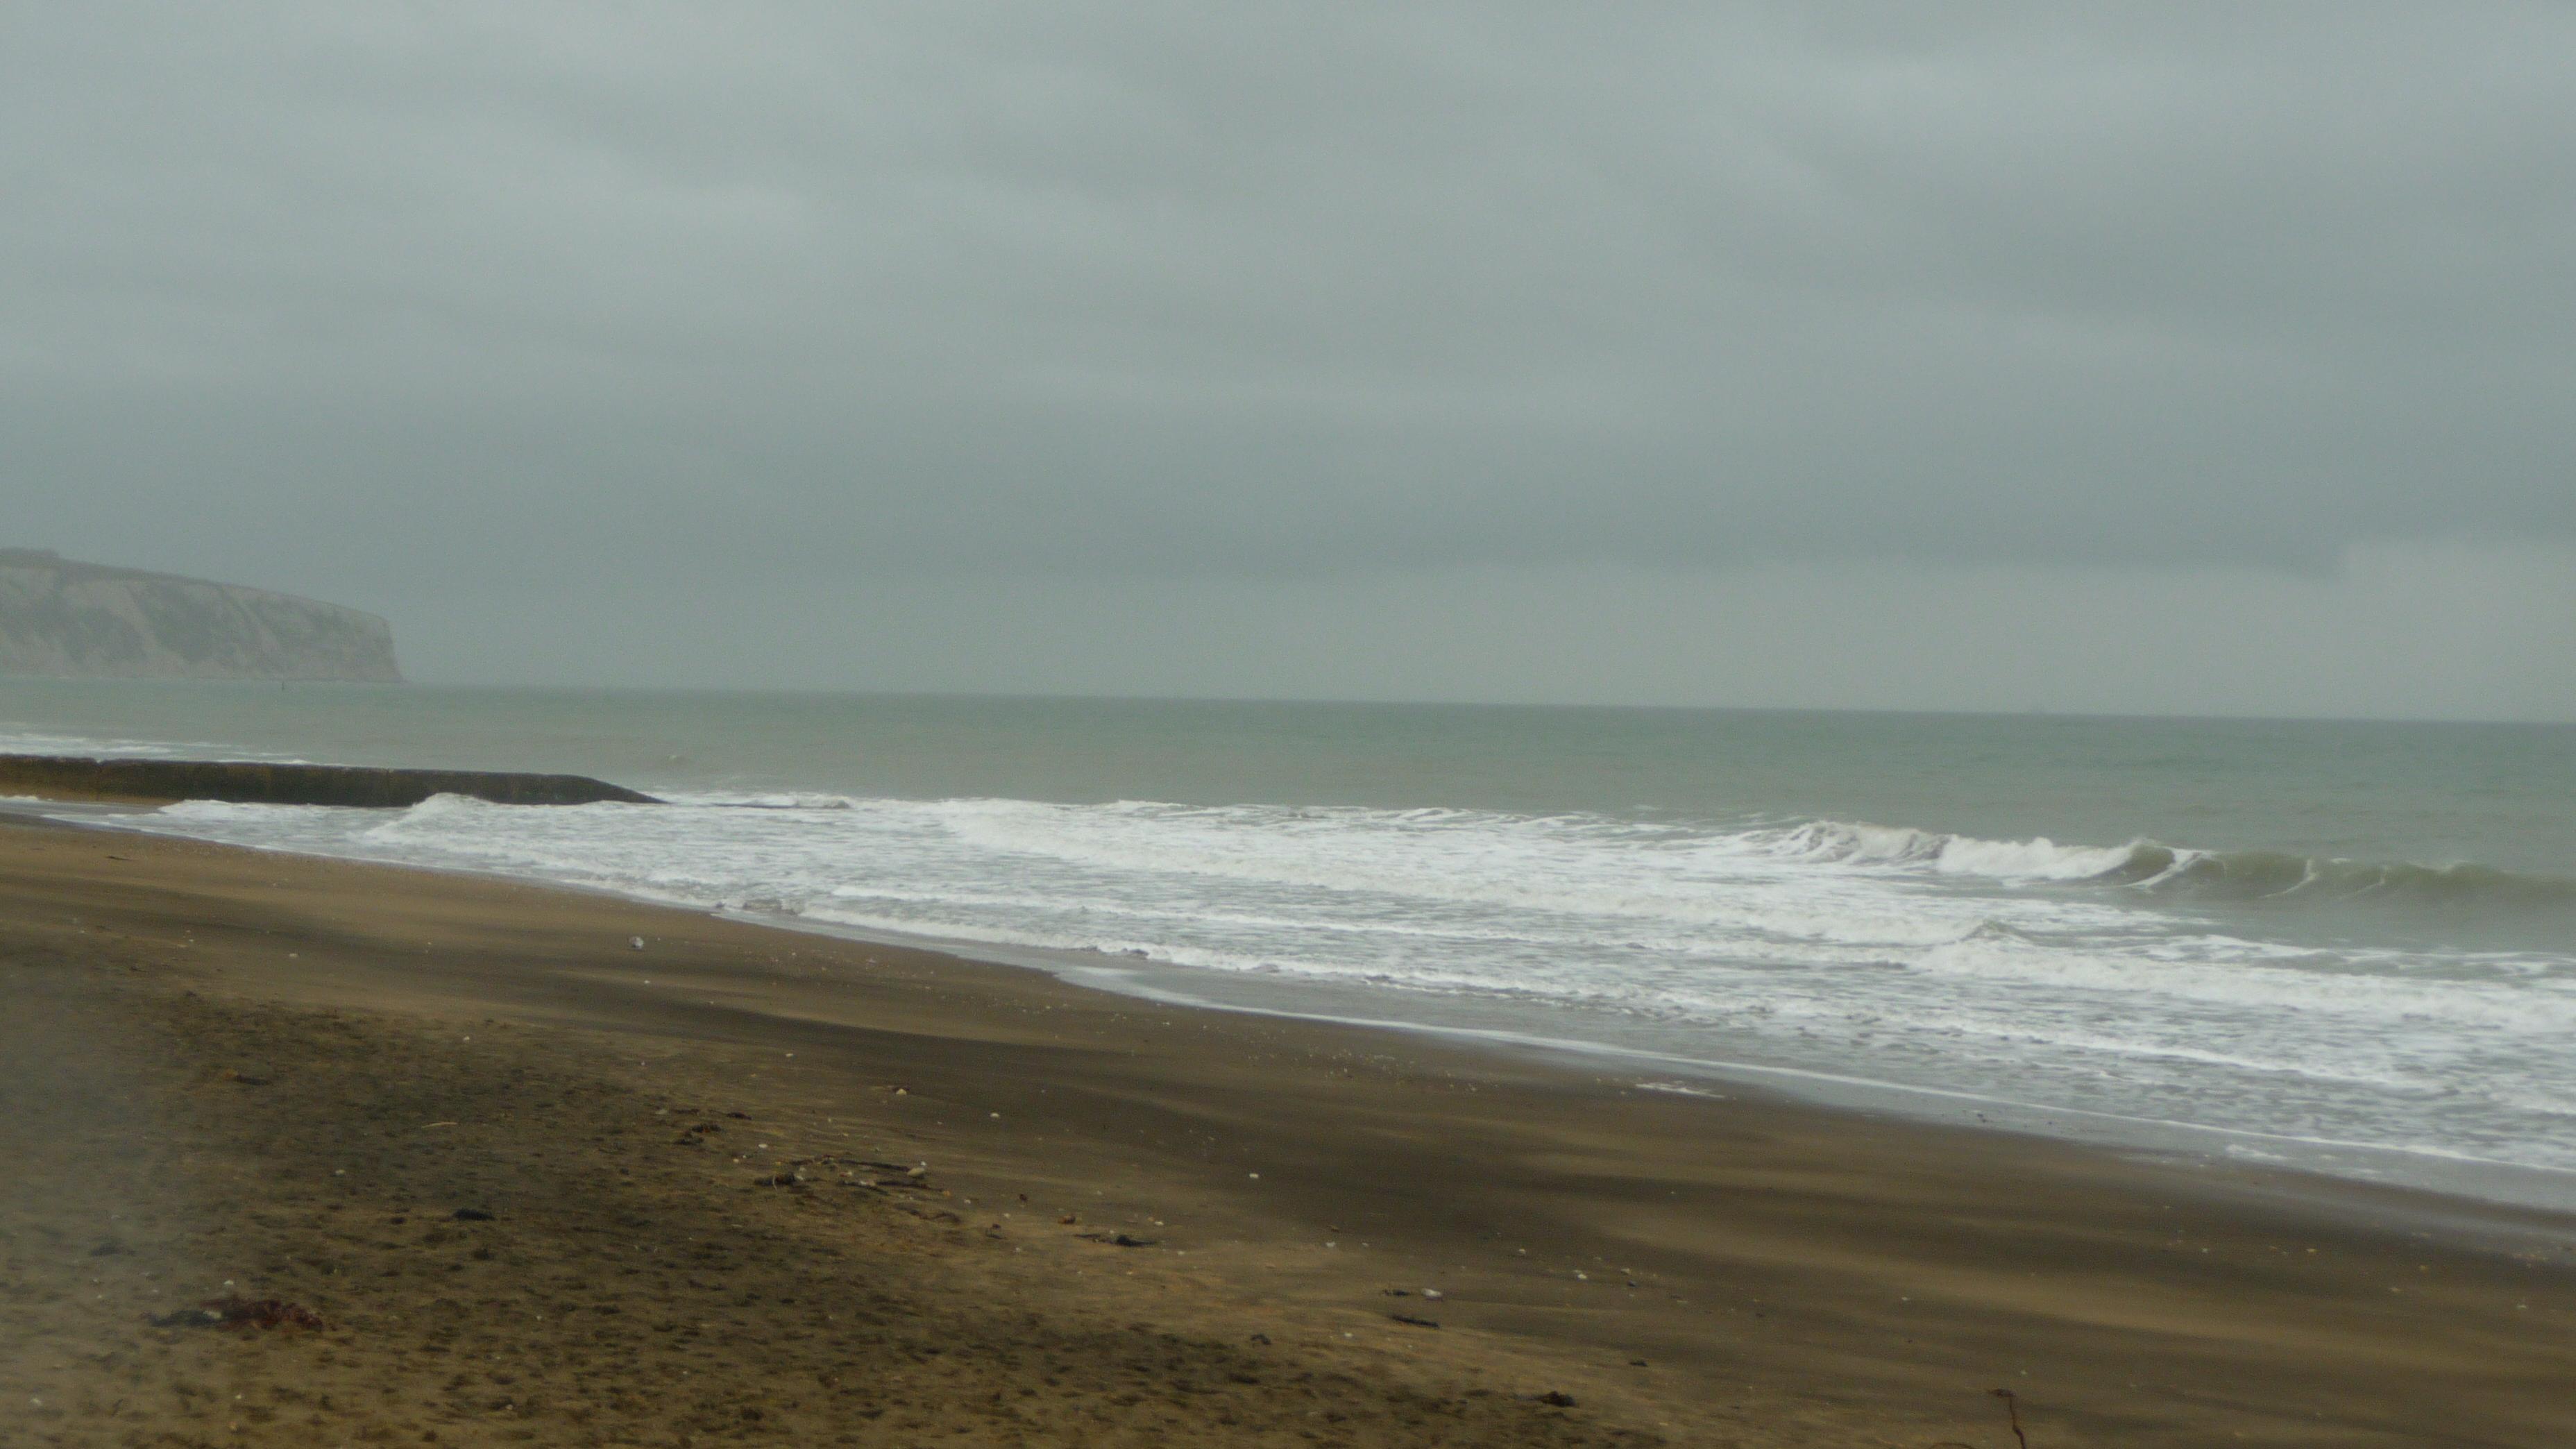 File:Sandown beach in bad weather 4.JPG - Wikimedia Commons